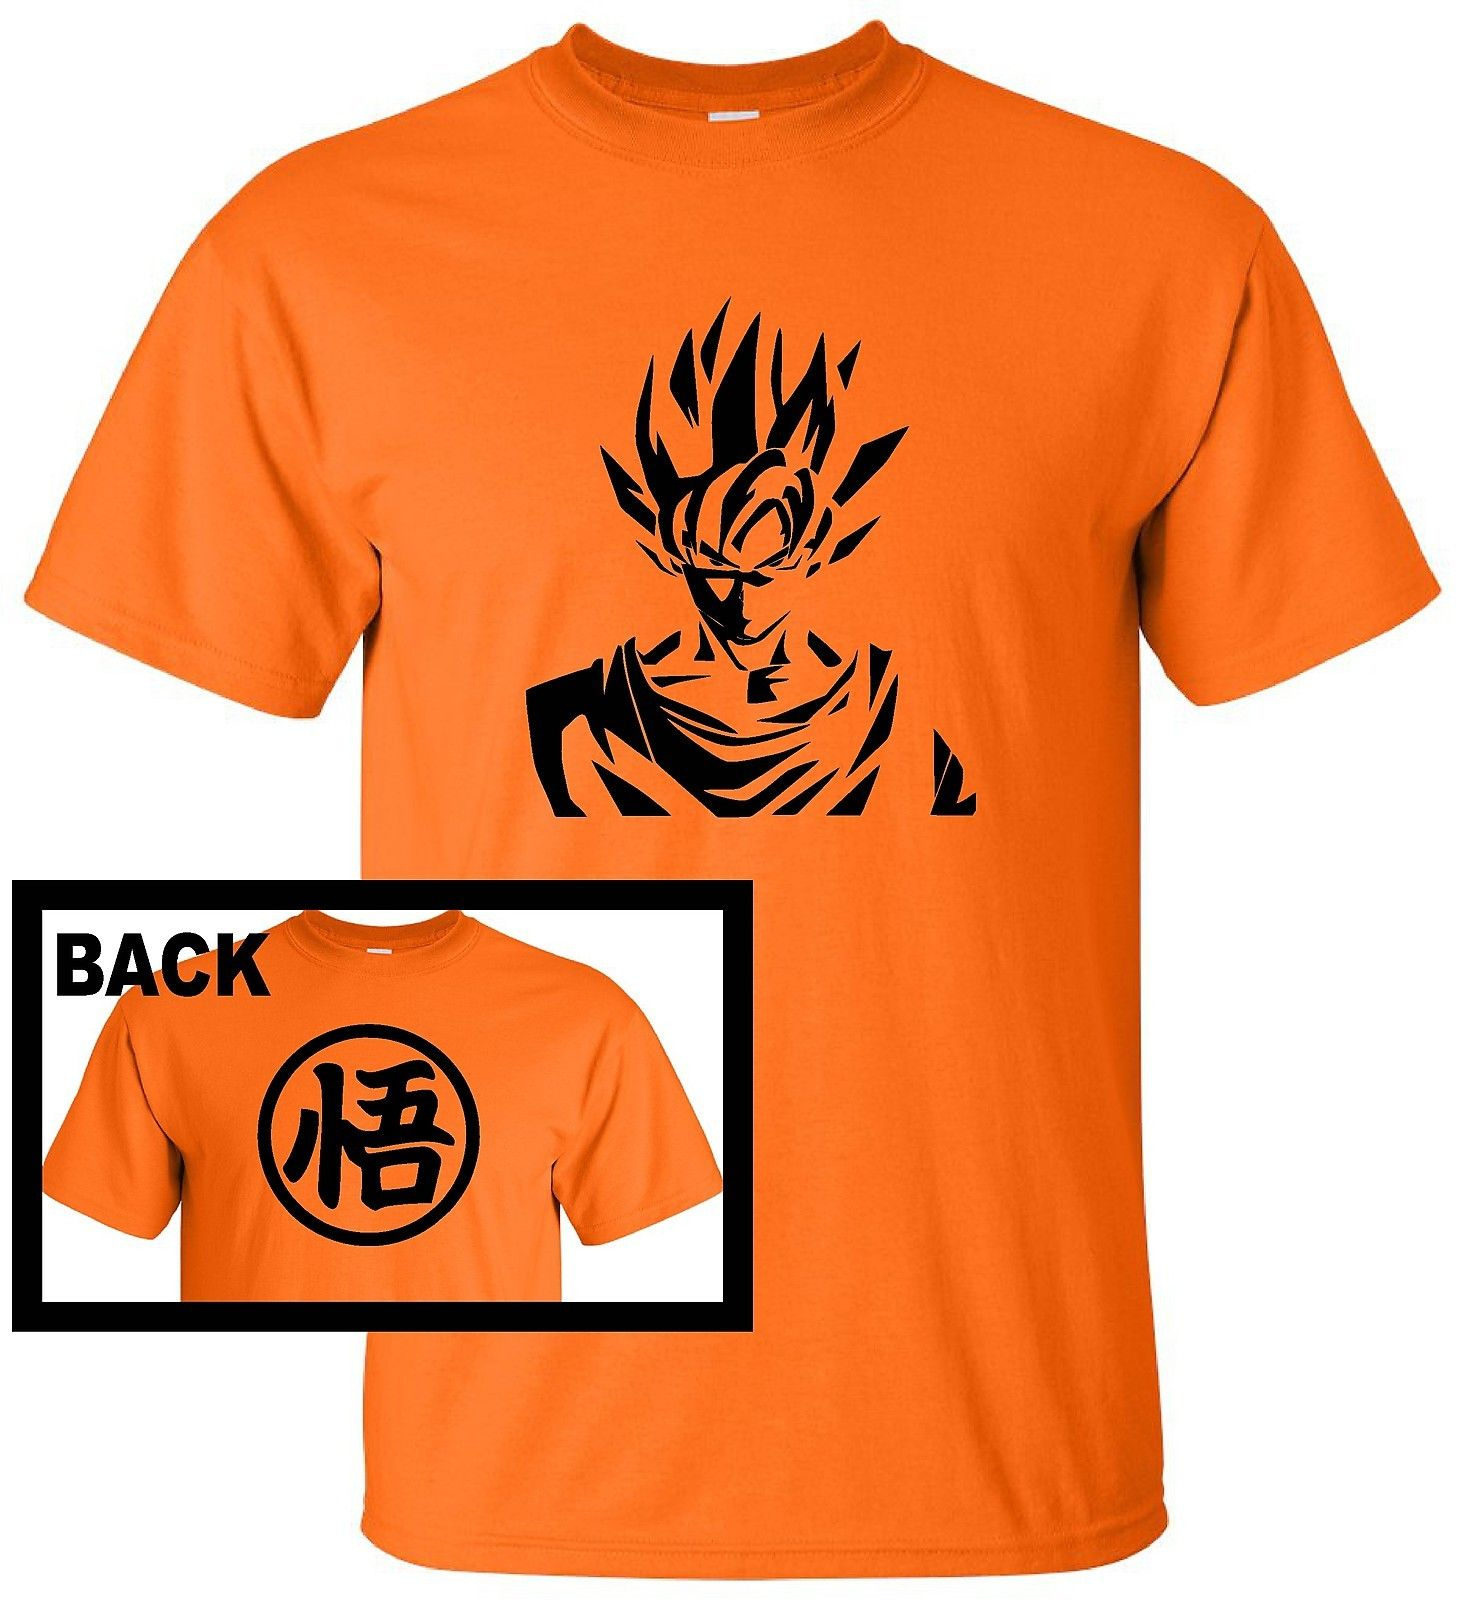 69faf0d4 Japanese Dragon Ball Z Anime DBZ SUPER SAIYAN G2 Funny T Shirt Goku Cosplay Free  shipping tshirt Harajuku Tops Fashion Classic